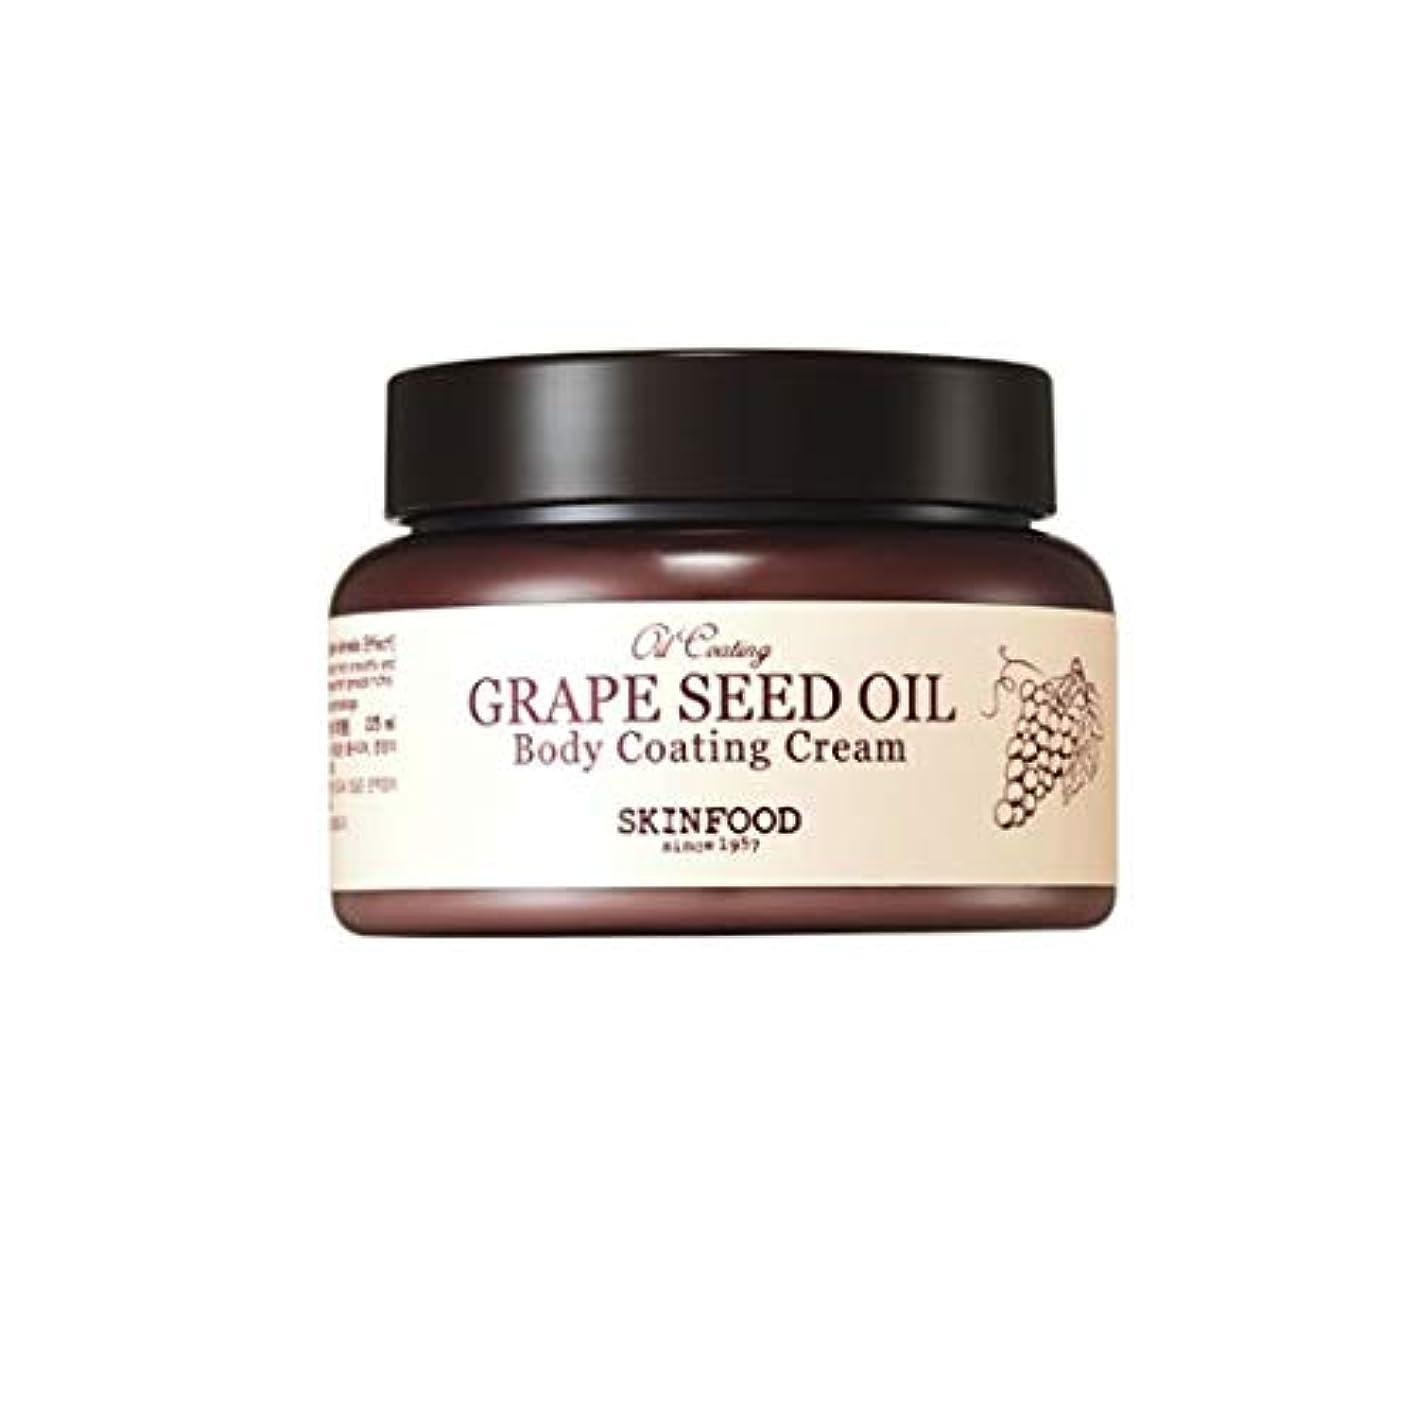 Skinfood グレープシードオイルコーティングボディクリーム/Grape Seed Oil Coating Body Cream 225 ml [並行輸入品]